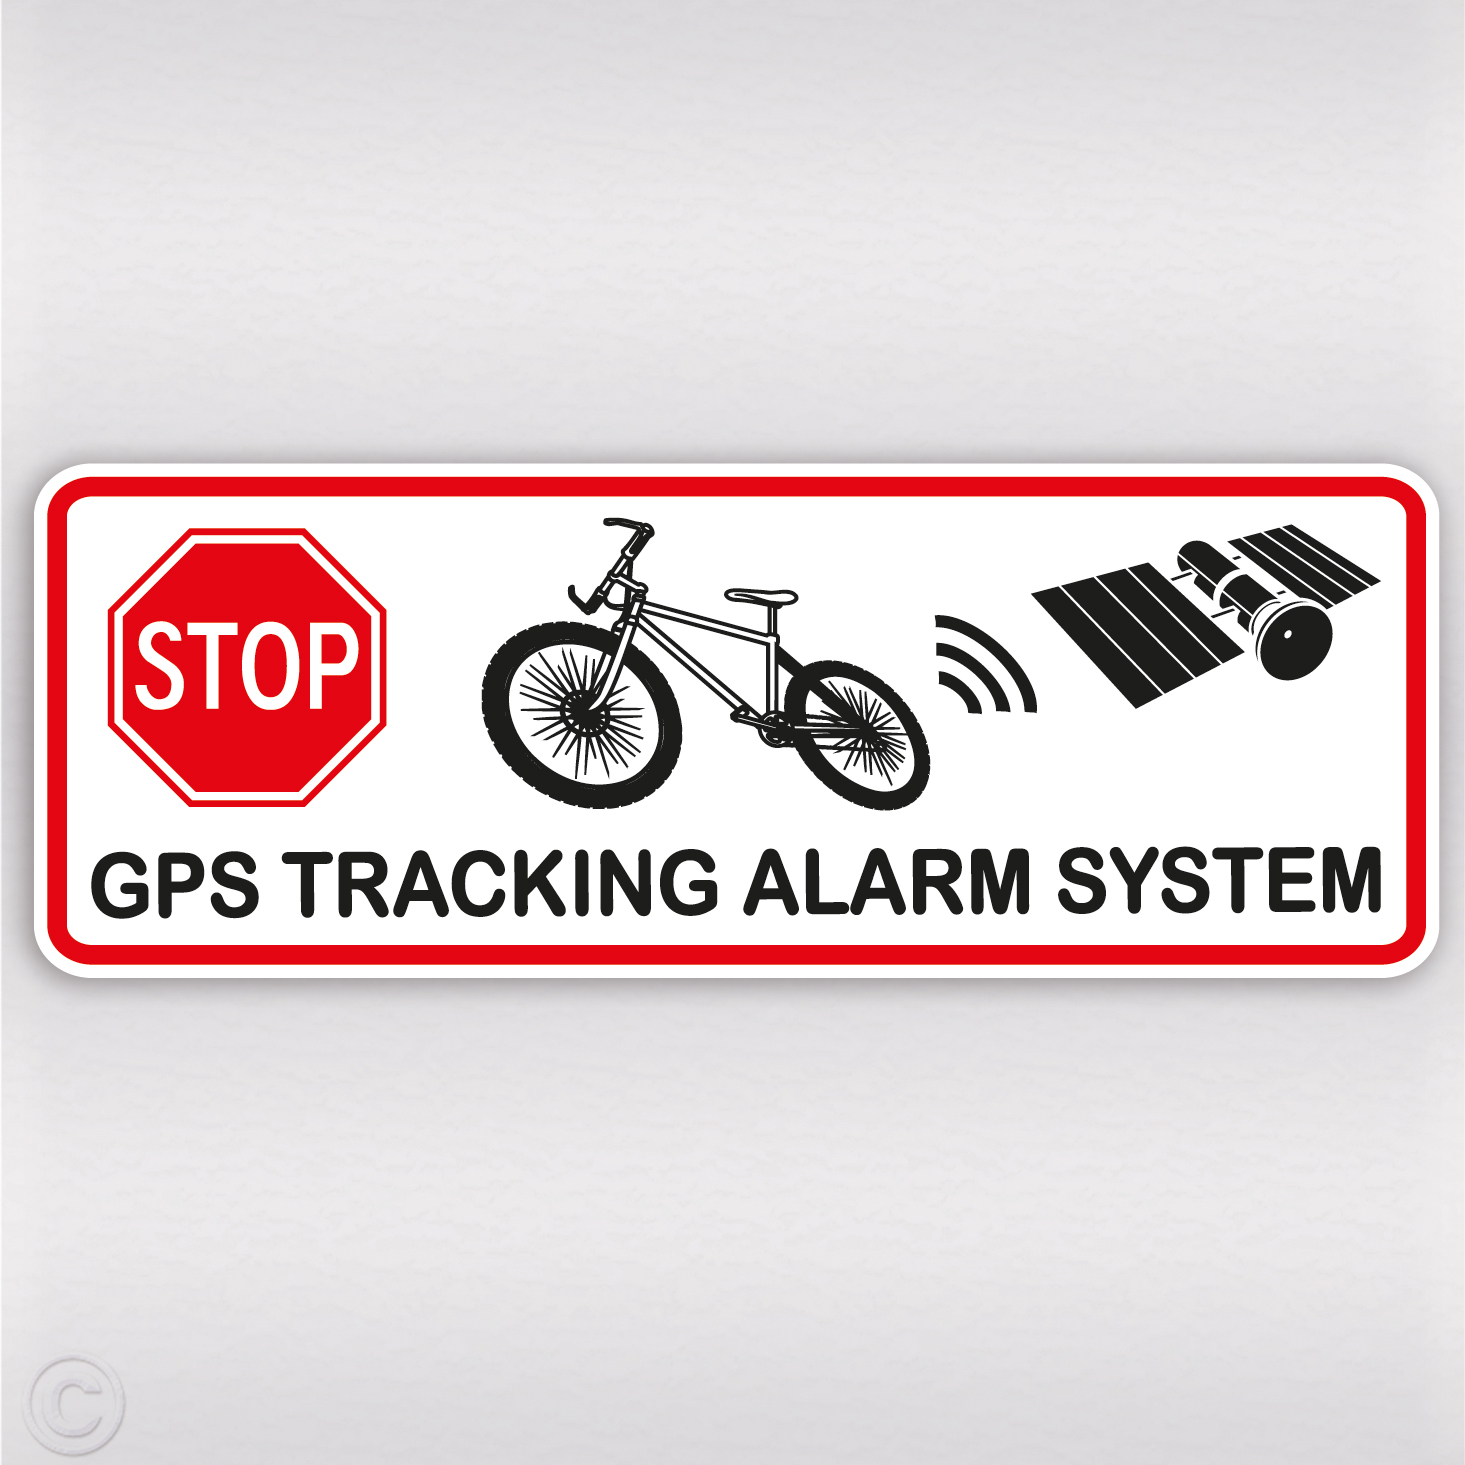 gps aufkleber fahrrad diebstahlschutz tracking alarm. Black Bedroom Furniture Sets. Home Design Ideas